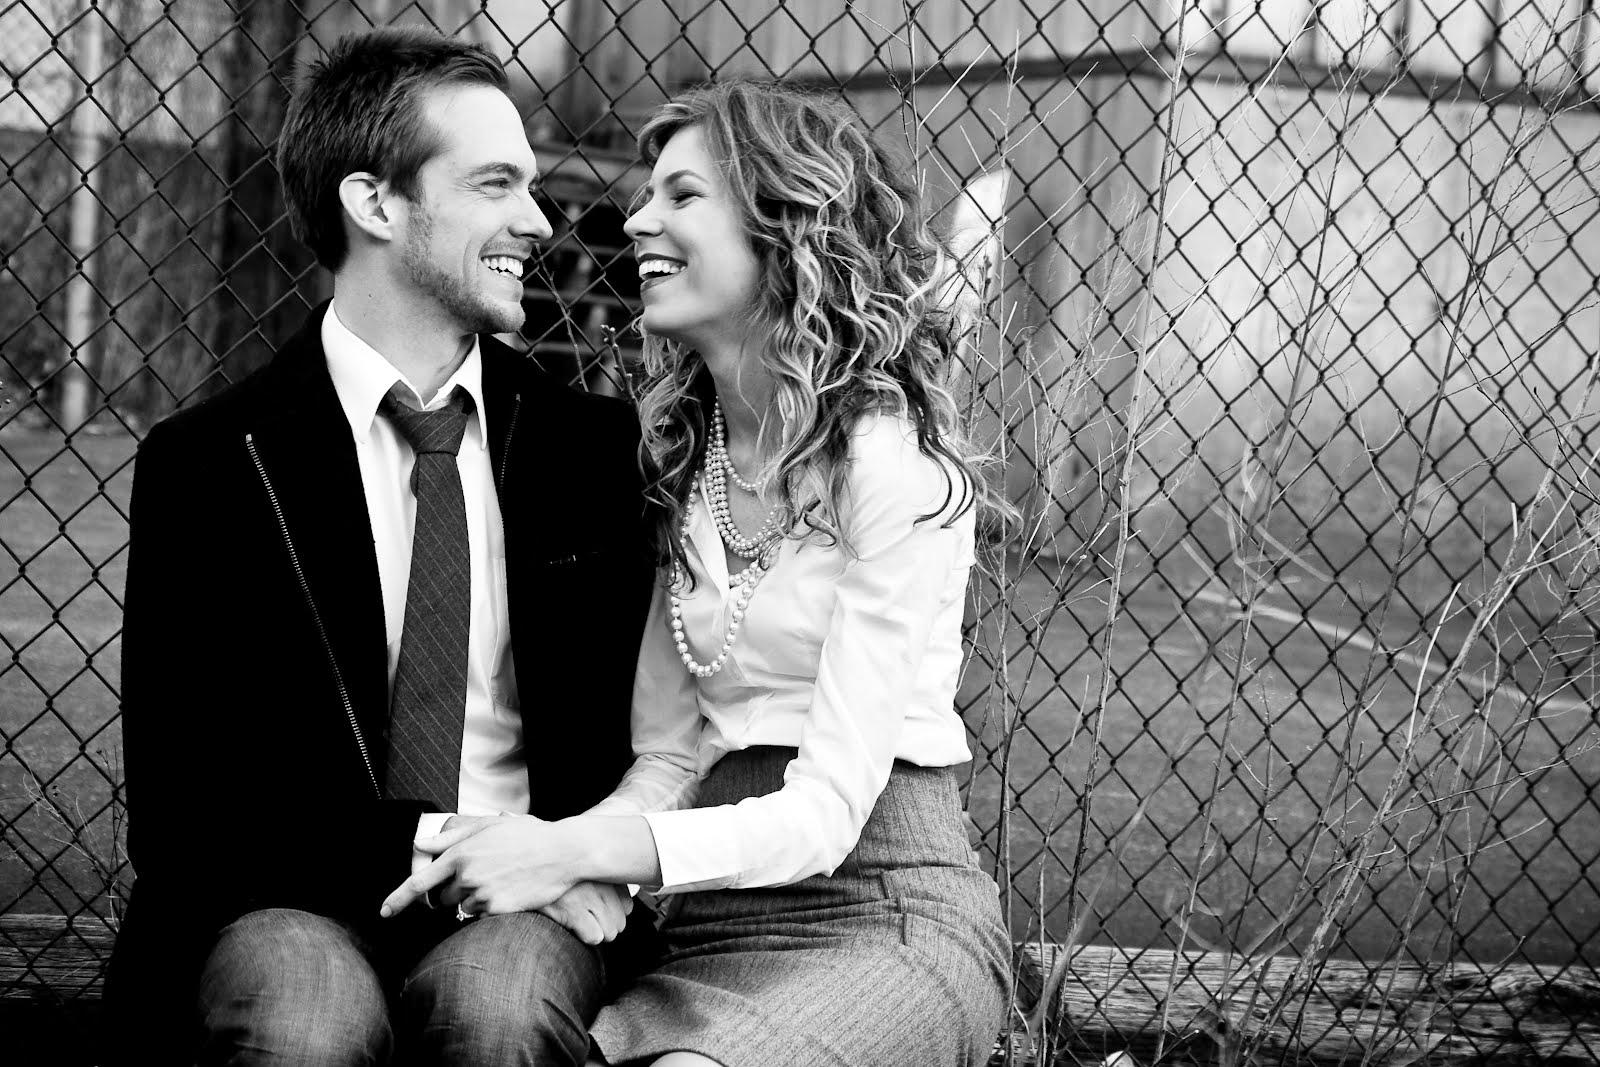 بالصور تحميل صور رومانسيه , رومنسيات جميله فى صورة 3876 6